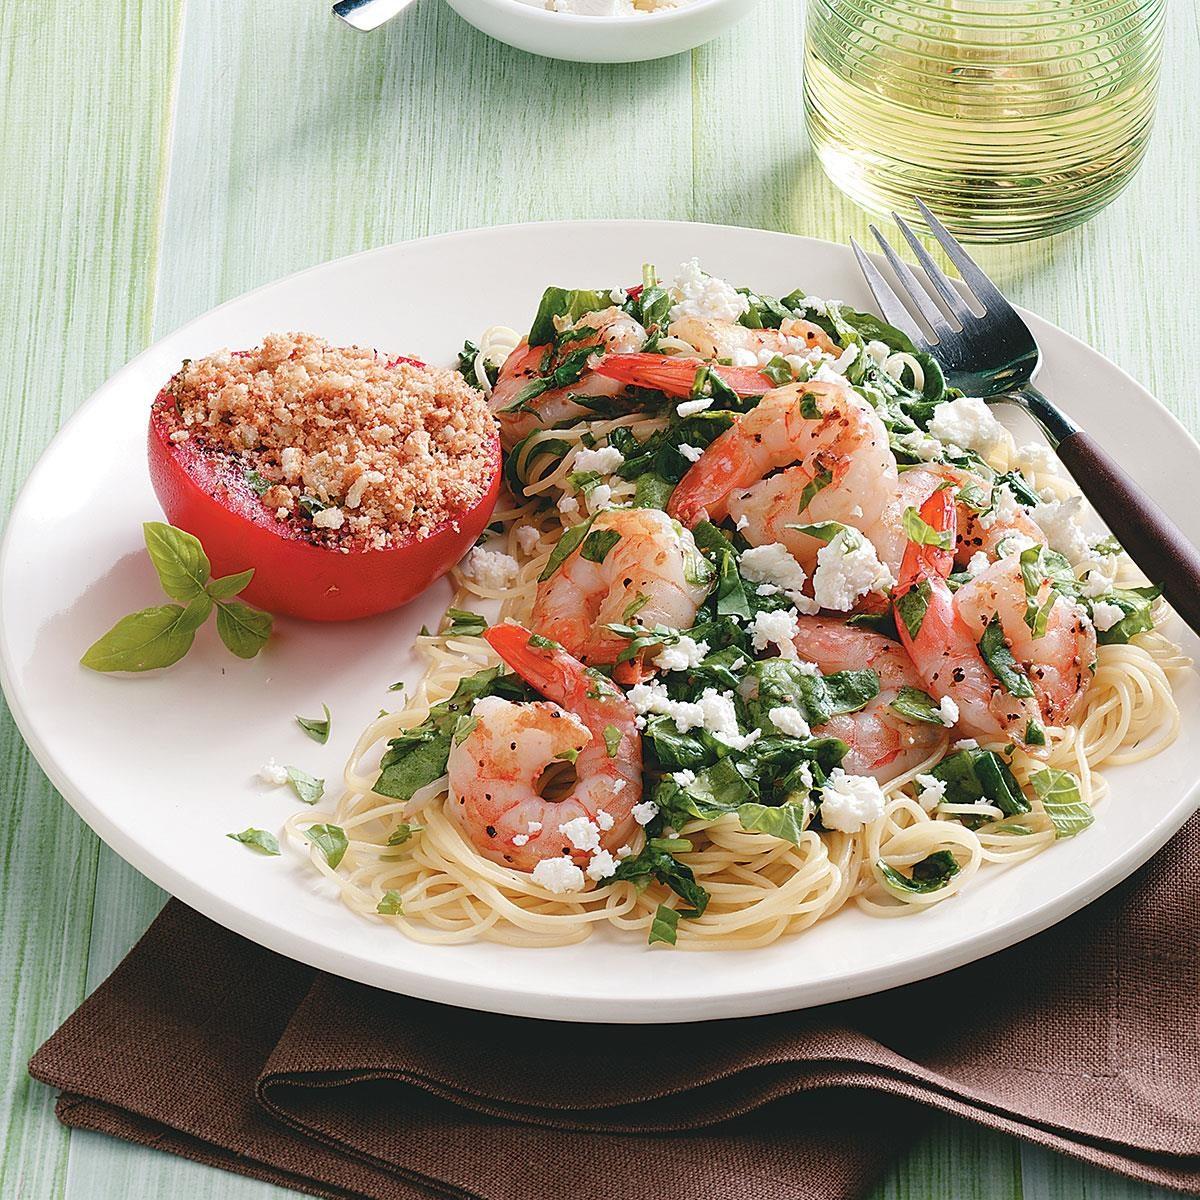 Mediterranean Style Recipes: Mediterranean Shrimp Skillet Recipe